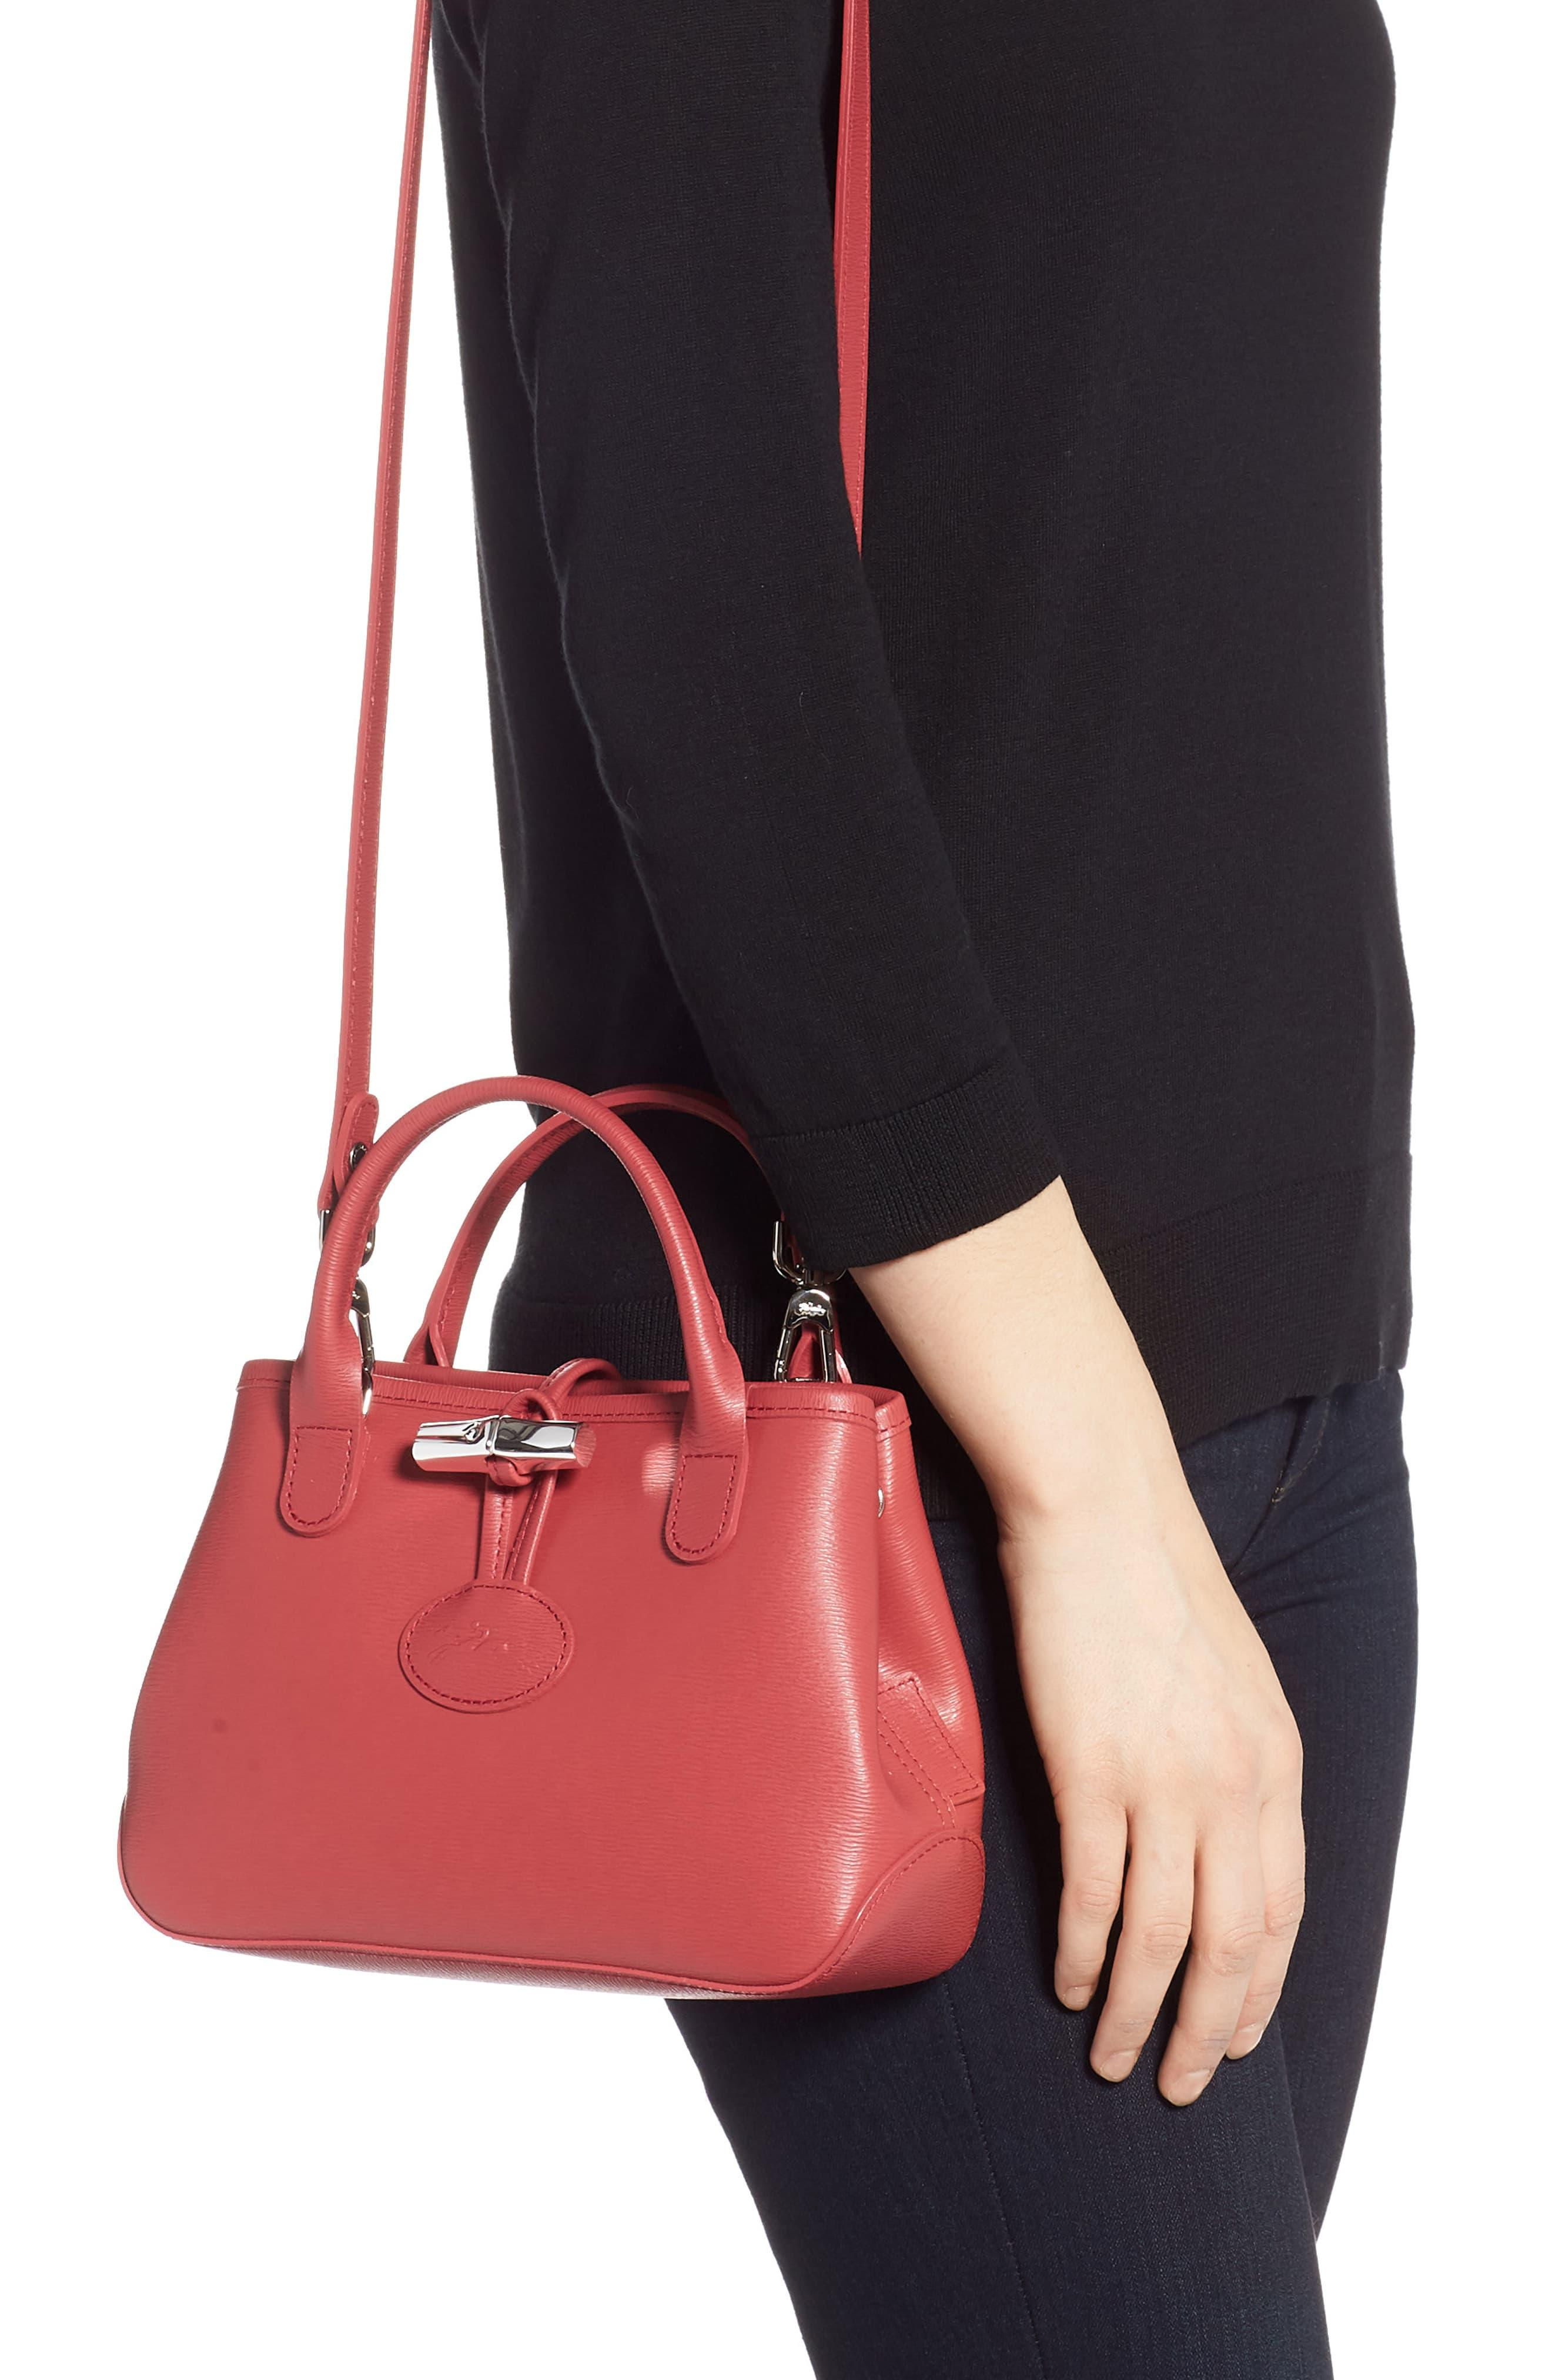 Roseau Leather Crossbody Bag